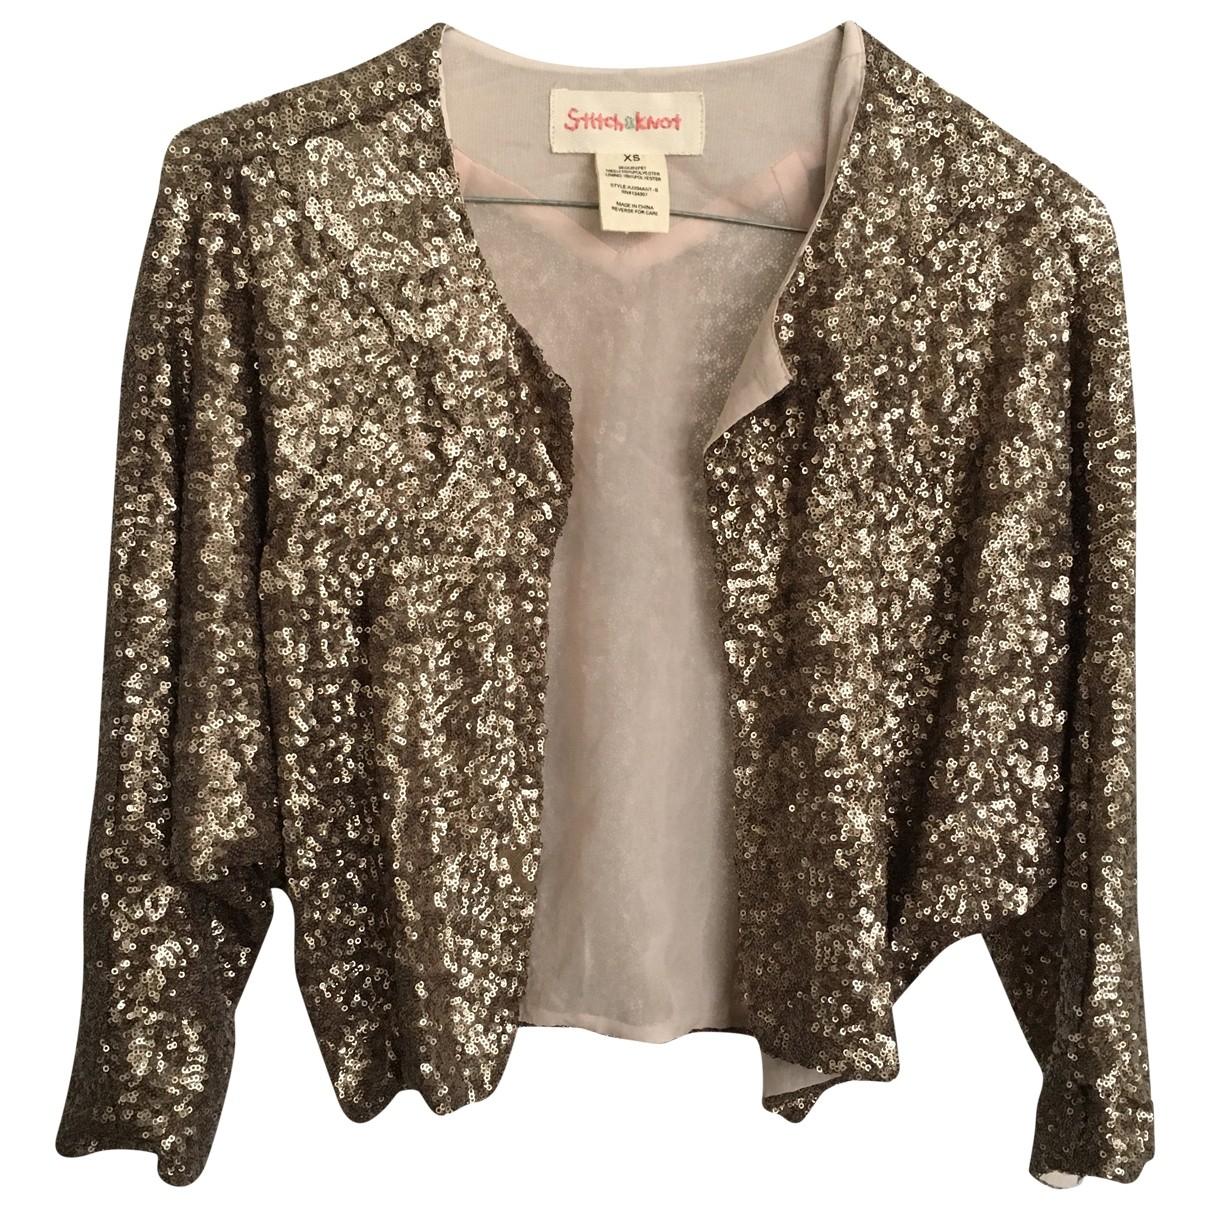 Anthropologie N Gold Glitter jacket for Women XS International